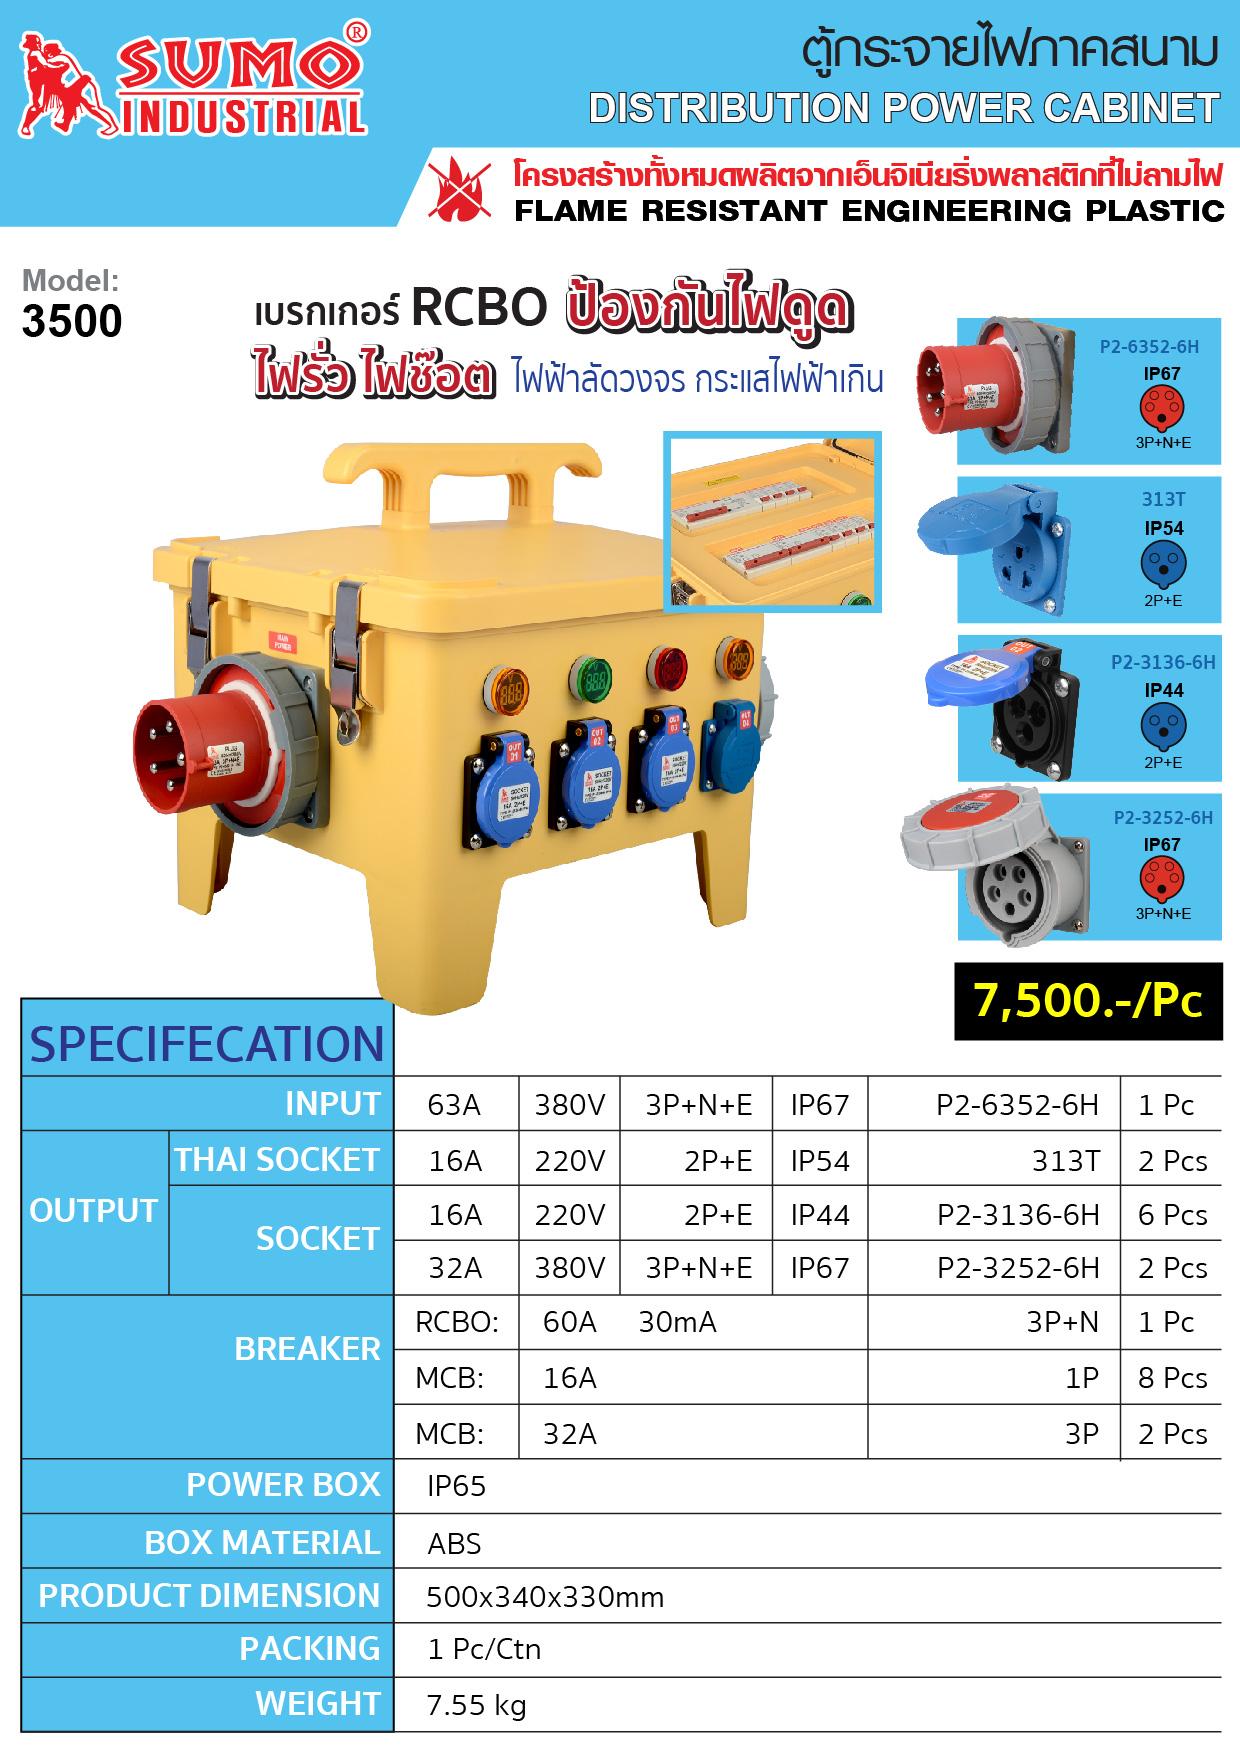 (184/188) Power Box